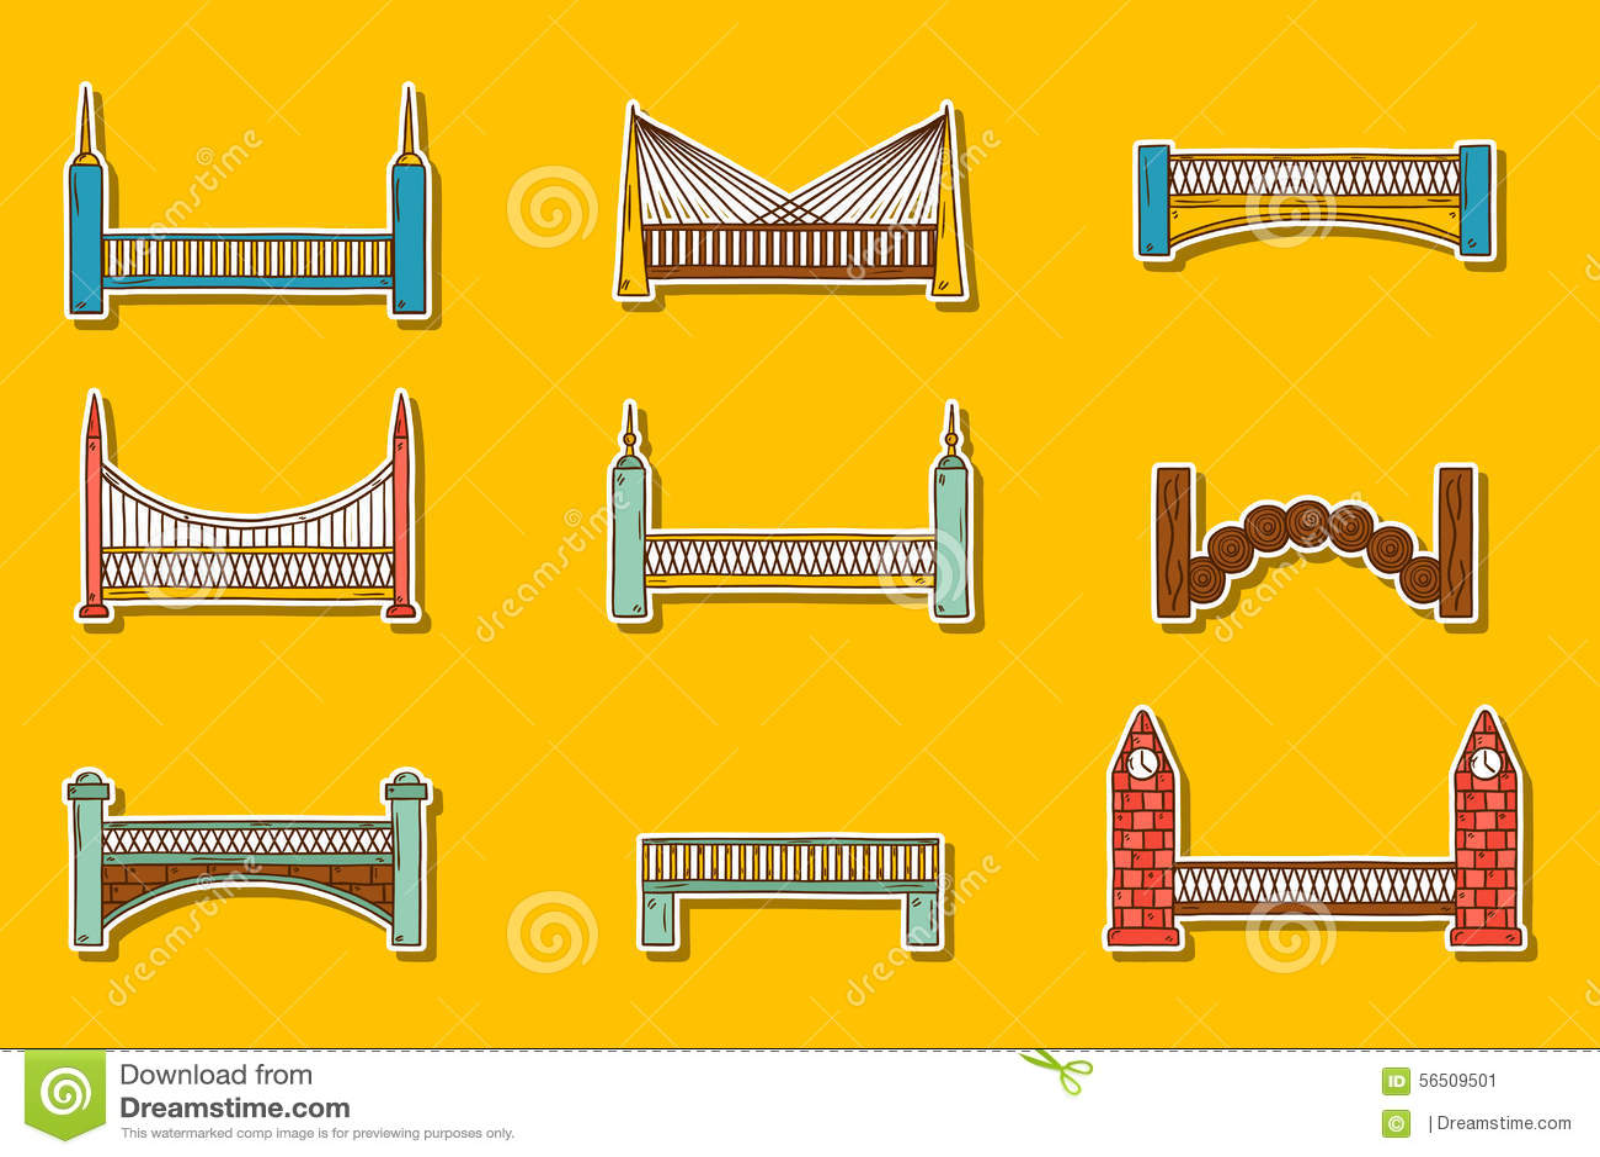 Set Of Water Transport Stickers Vector Illustration